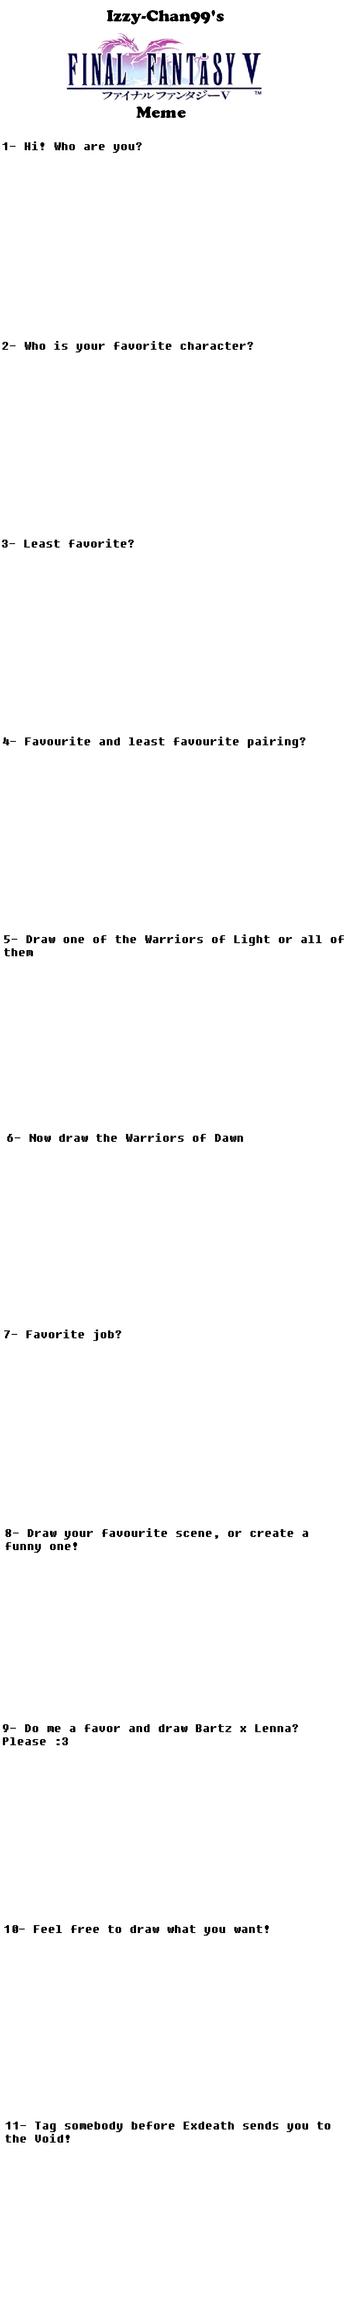 Final Fantasy V meme by HansCampanella